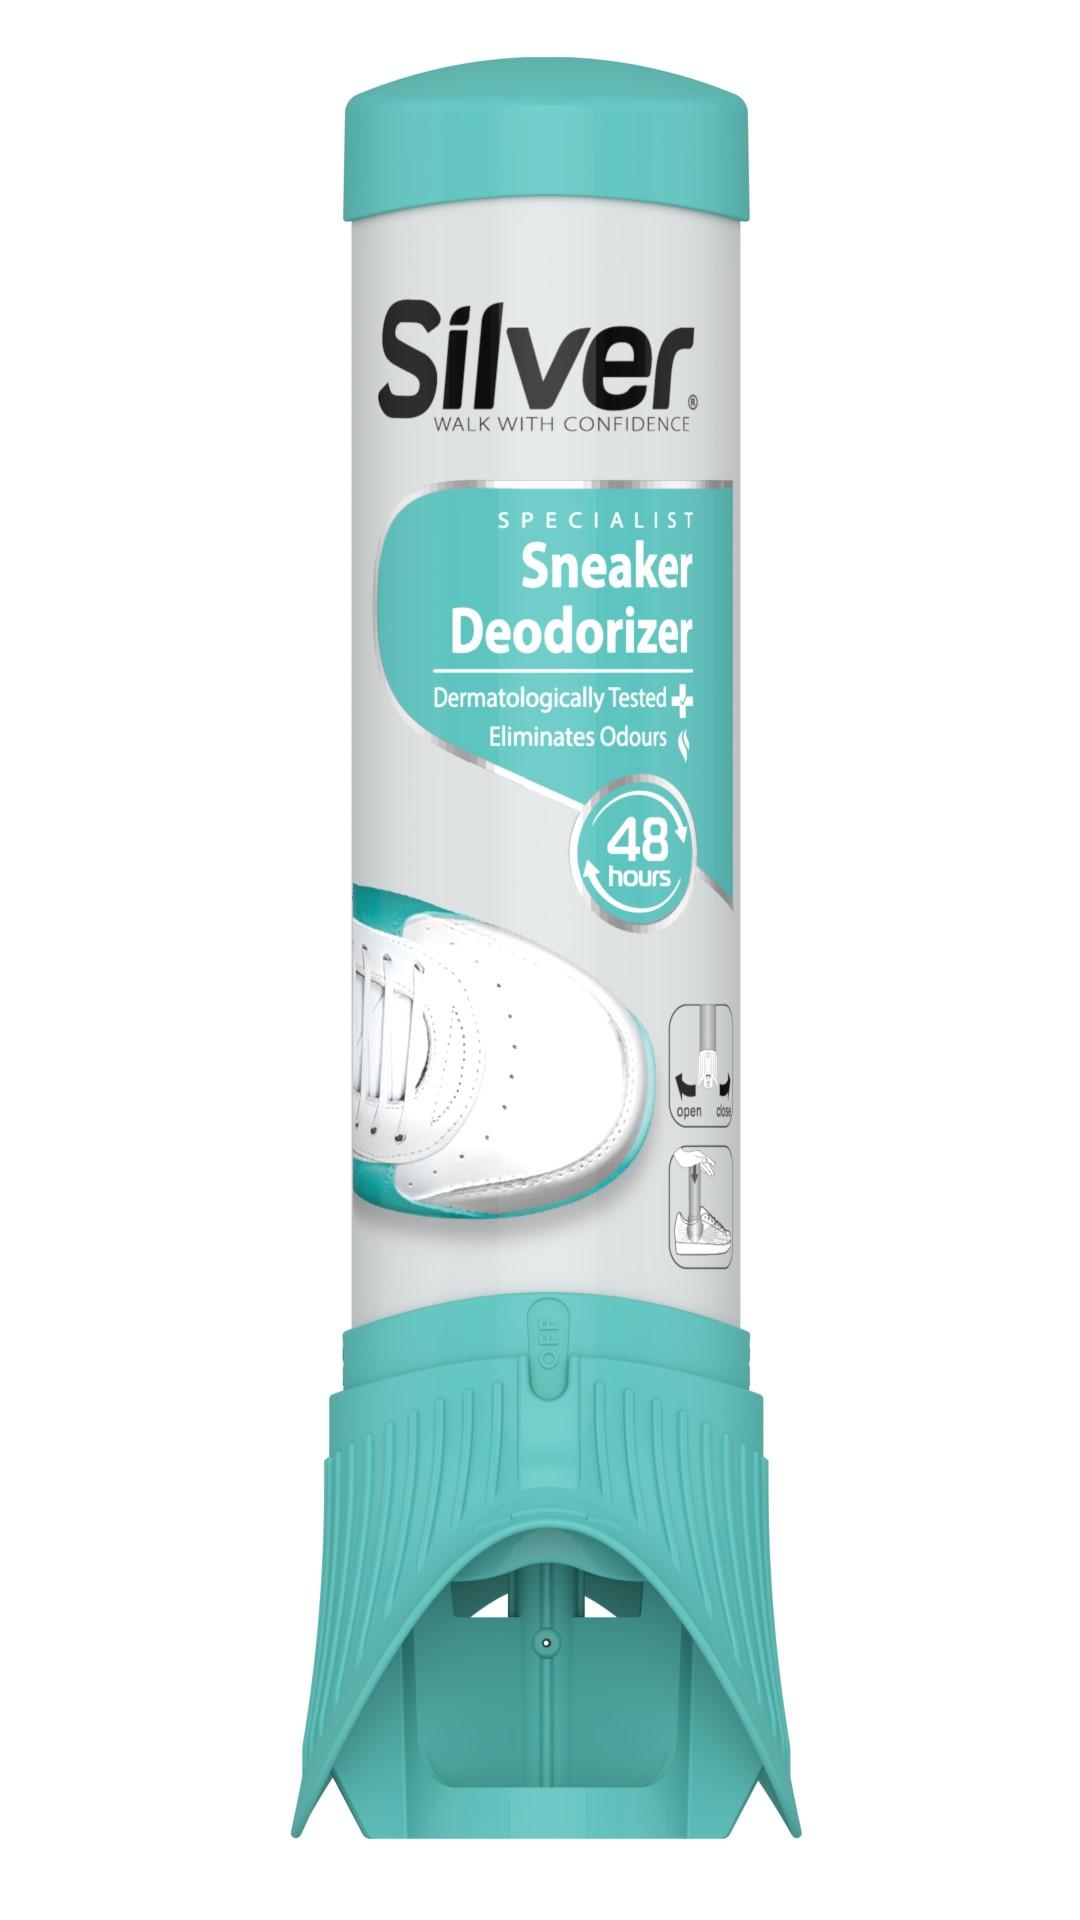 sneaker deodorizer